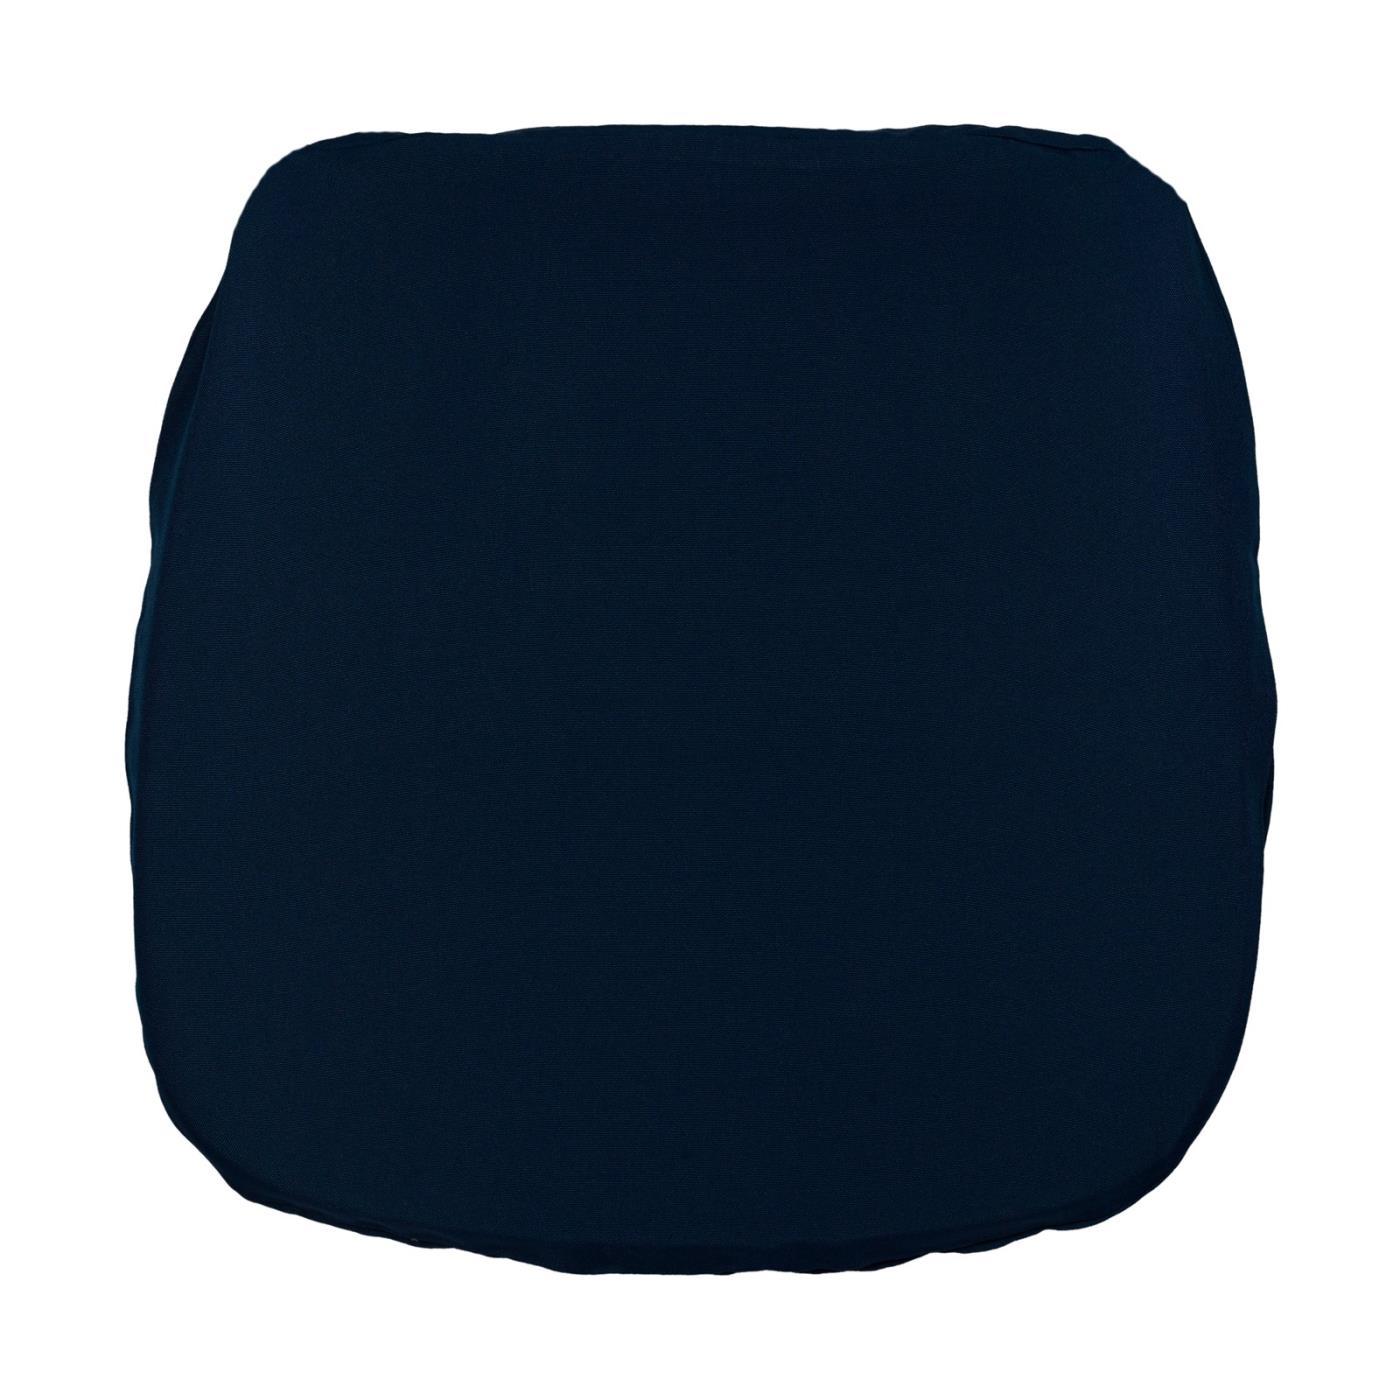 Poly Seat Cushion - Navy